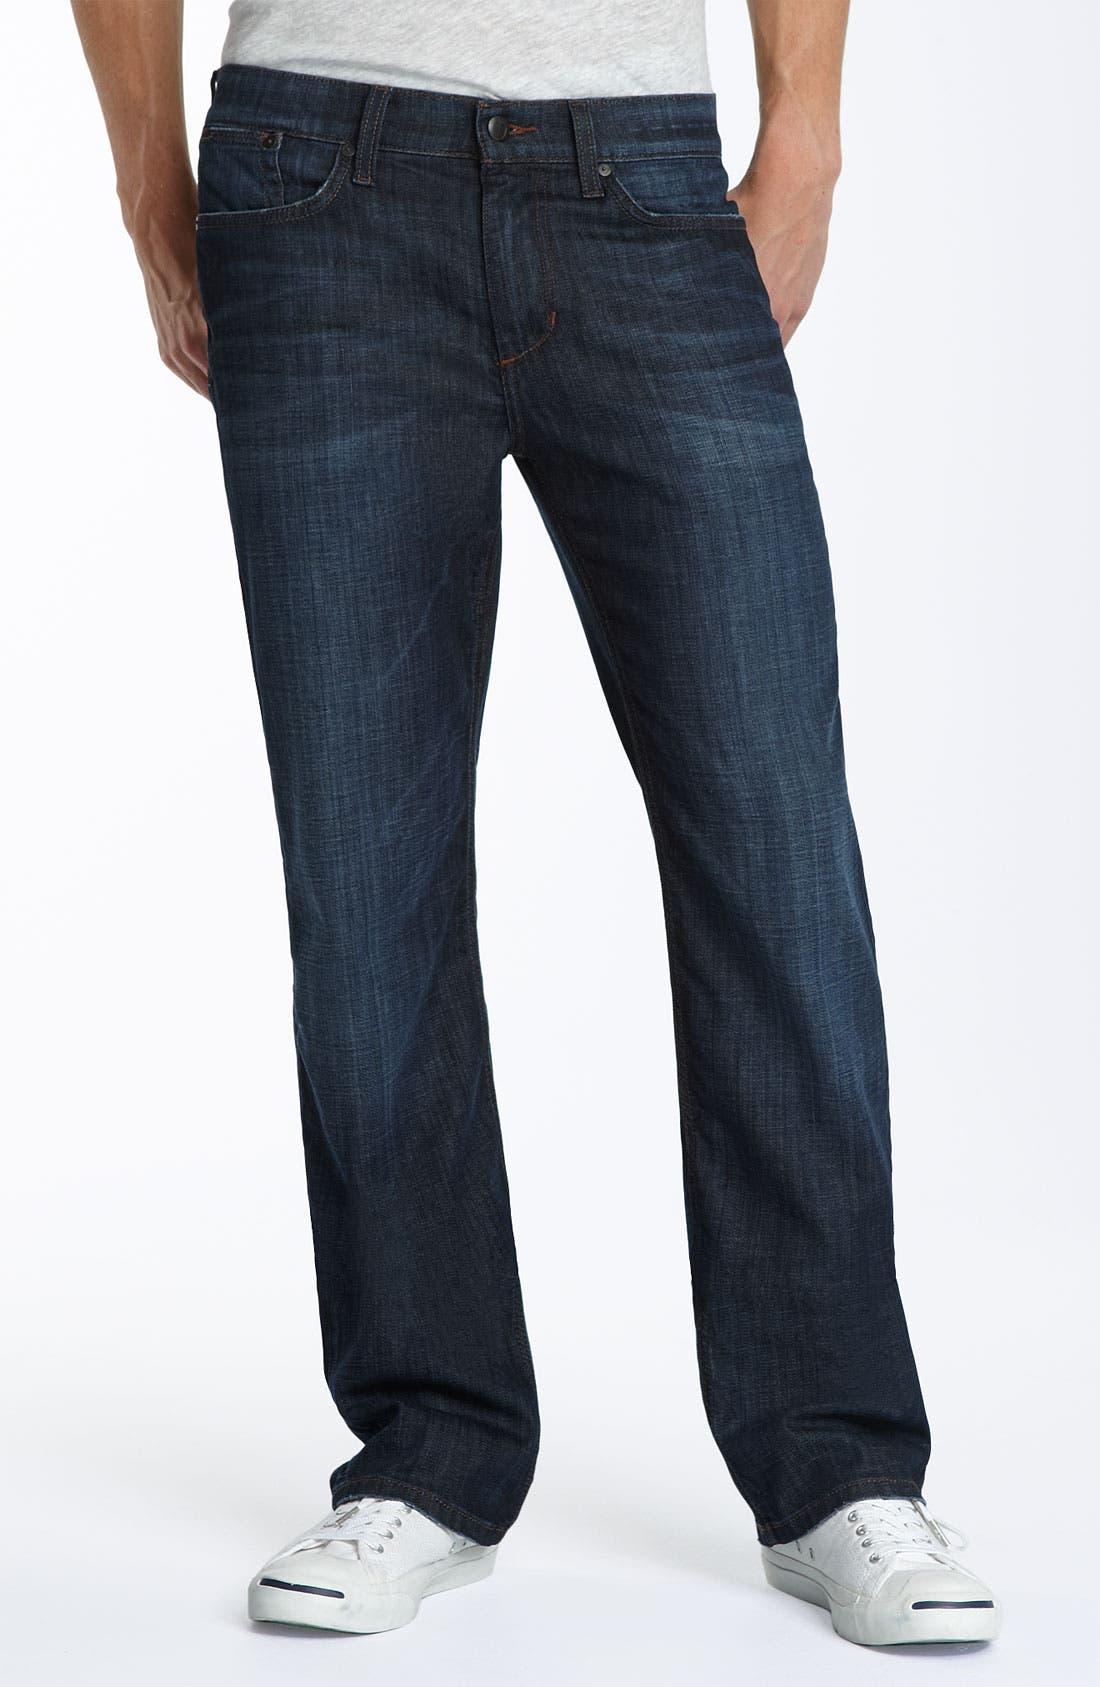 Alternate Image 1 Selected - Joe's 'Classic' Straight Leg Jeans (Dixon) (Tall)